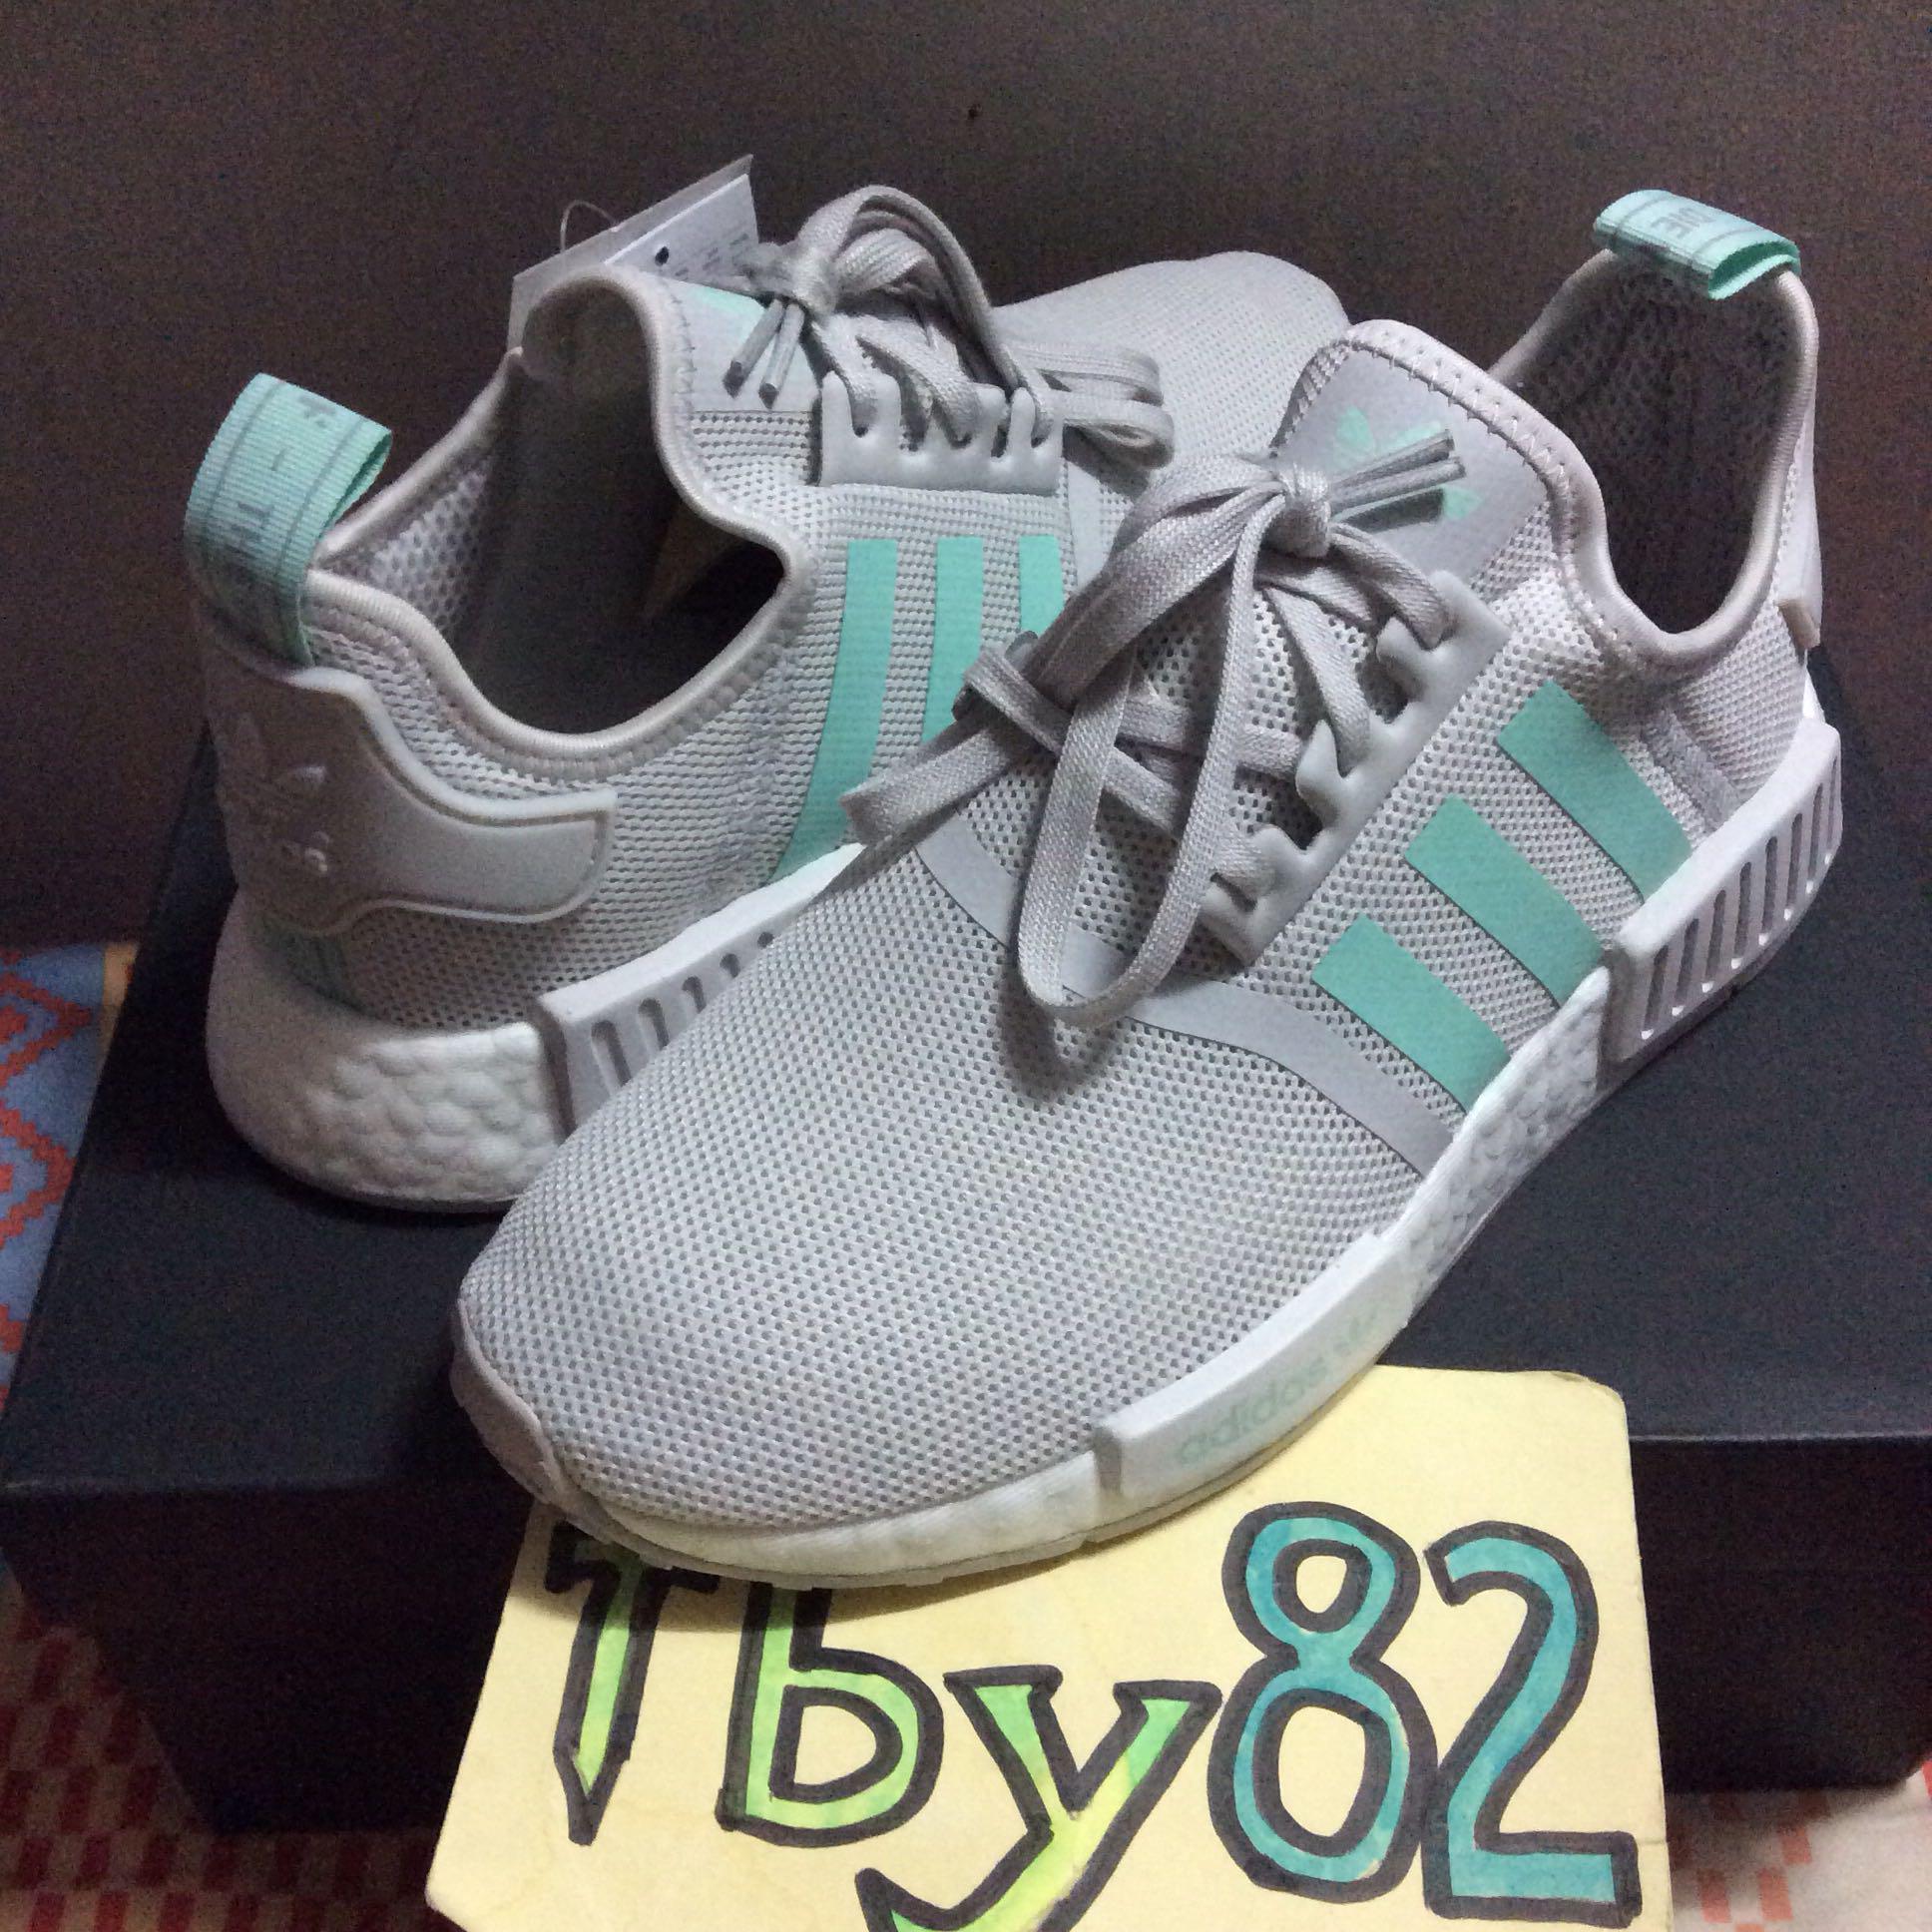 PO) Adidas NMD R1 Jr Grey Mint Green, Bulletin Board